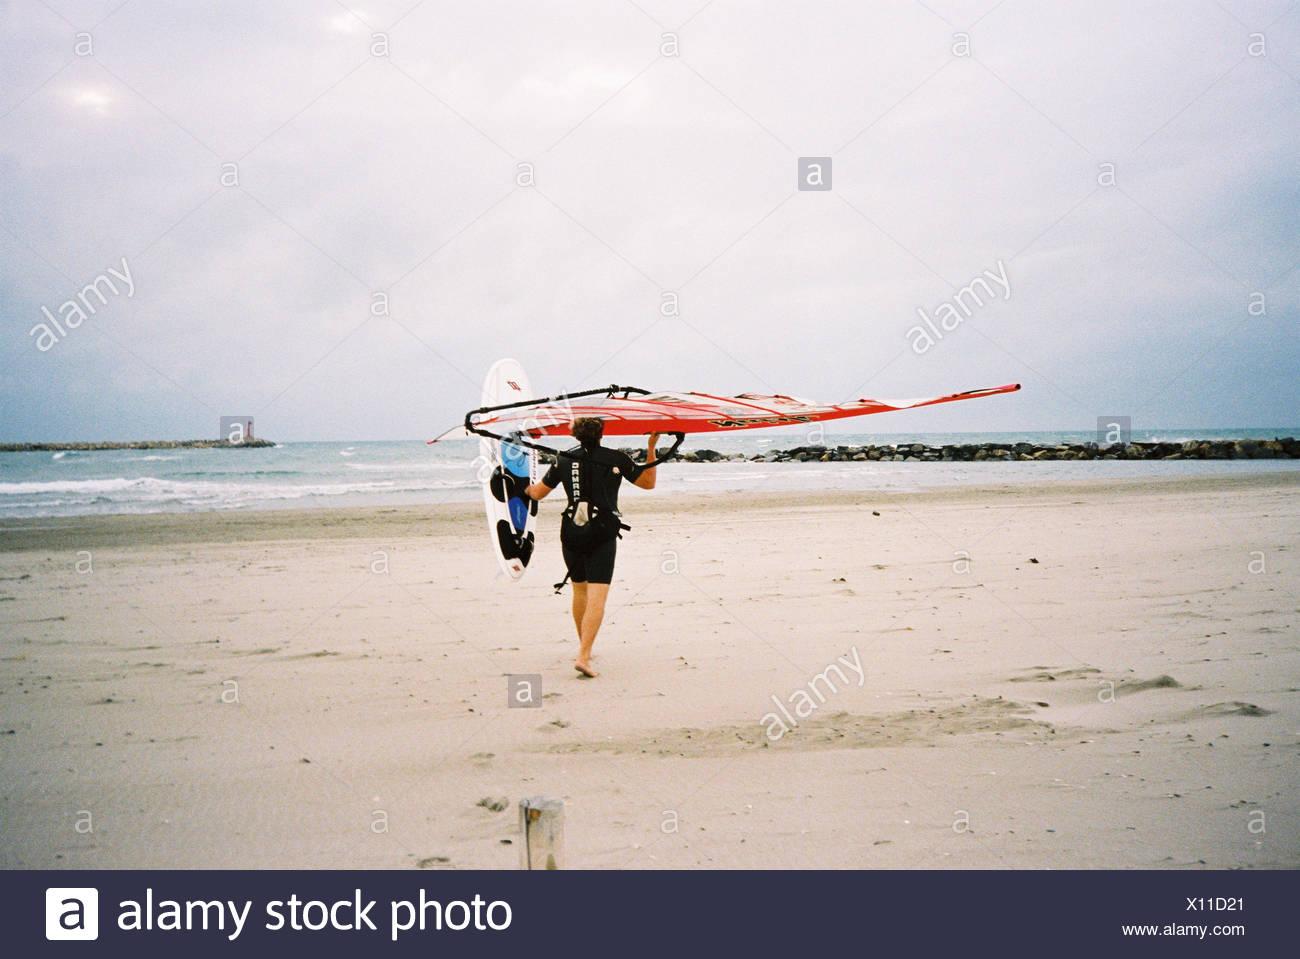 Man, surfboard, beach, carries,  Move opinion,   France, St. Marie of de la Mer, sea, windsurfers, Speedsurfer, Finian Maynard, athletes, sport, surfing, windsurfing, windsurfing, surfboard, board, sails, training, - Stock Image